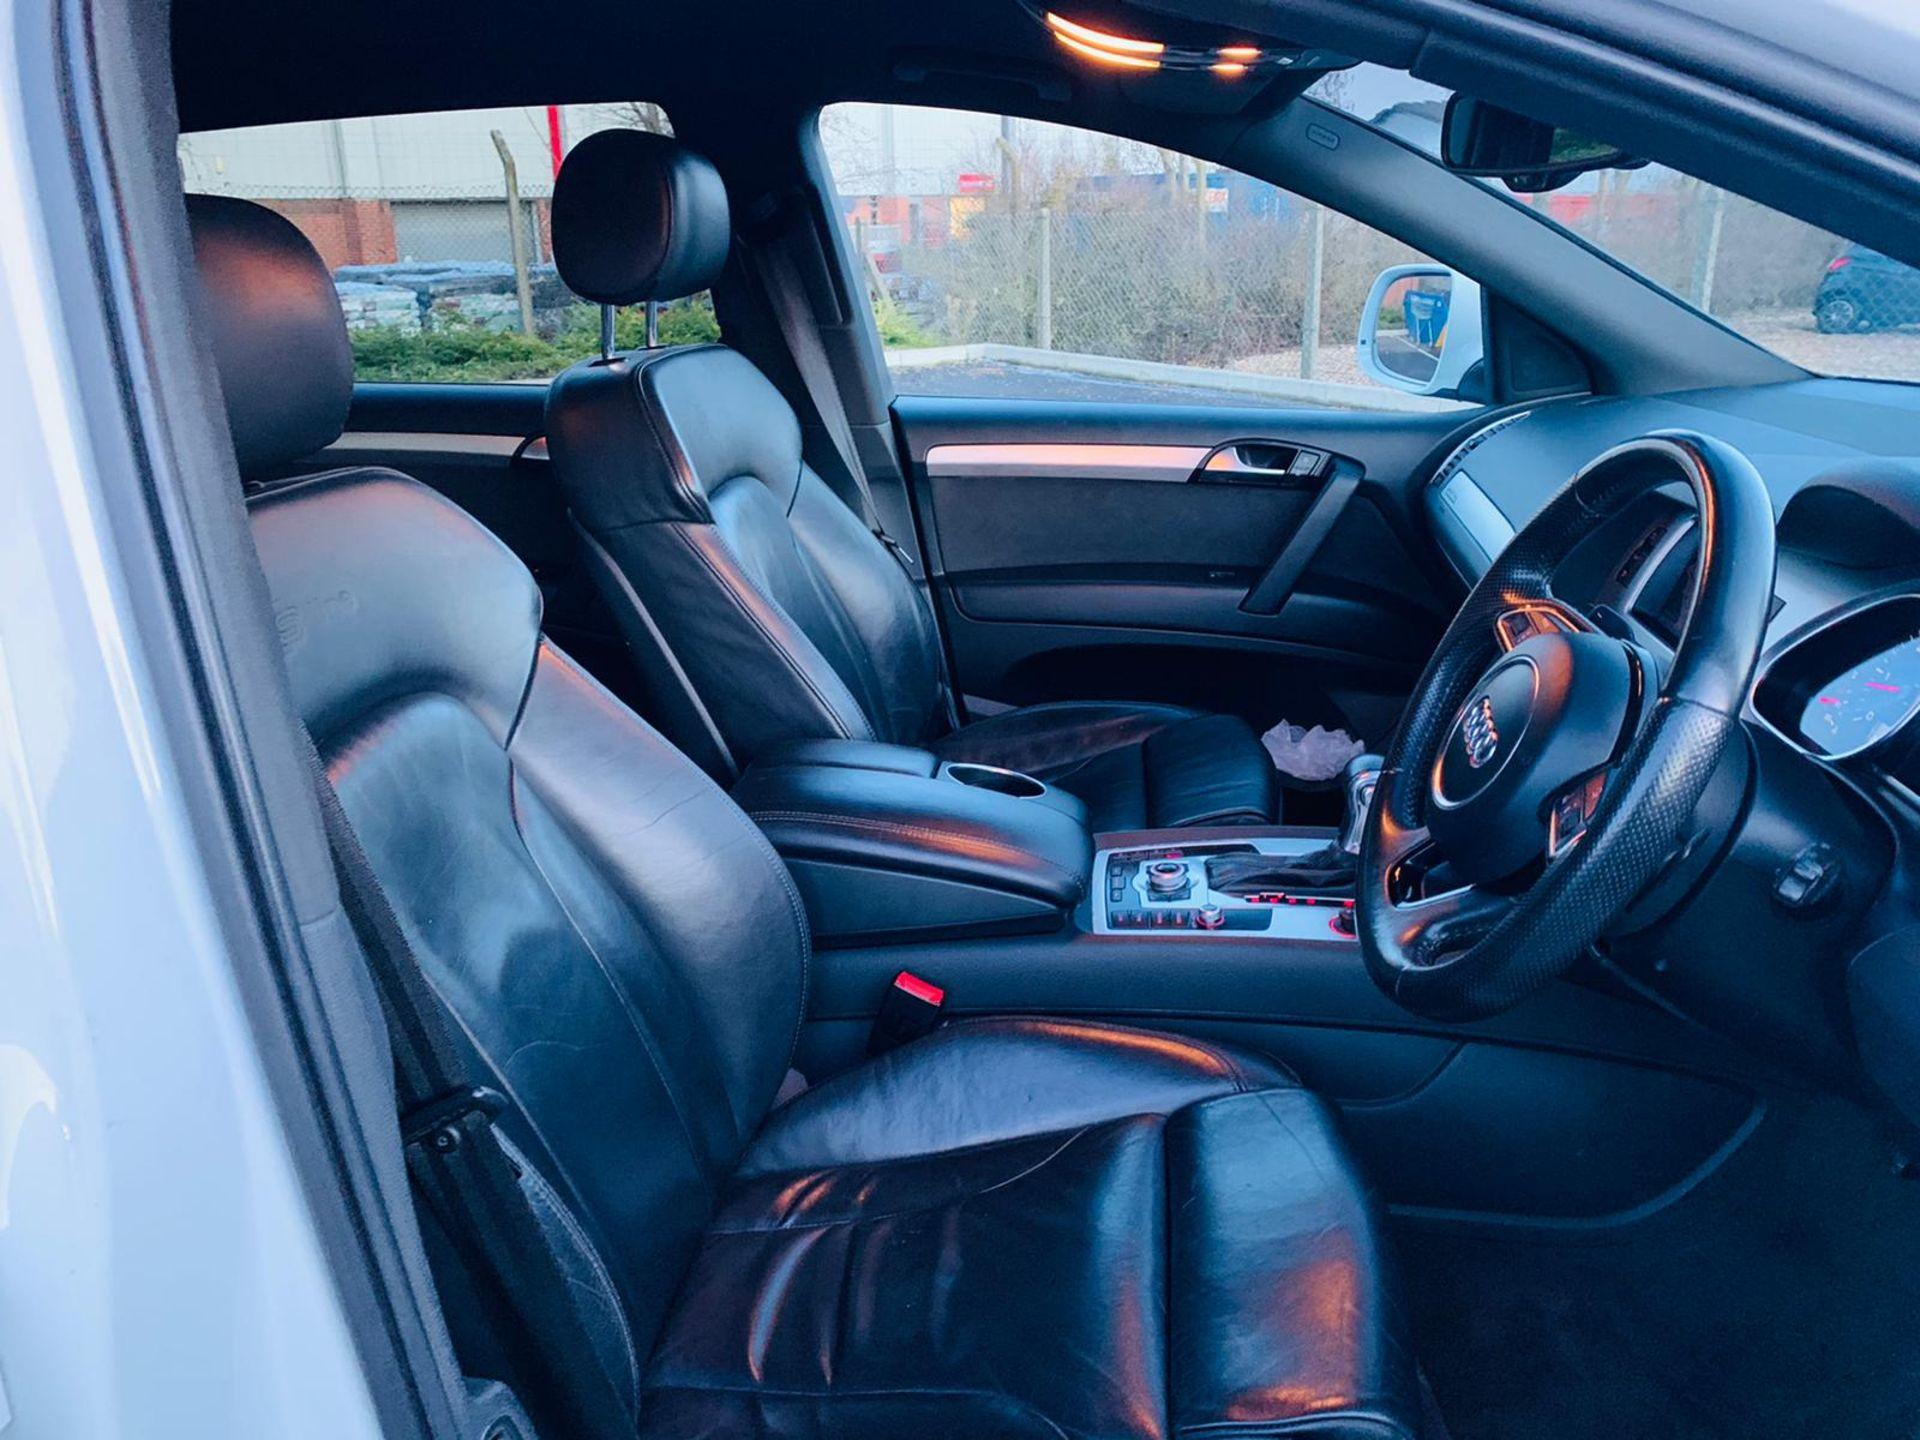 (Reserve Met)Audi Q7 3.0 TDI Quattro S Line Plus Auto (7 Seats) - 12 Reg - Only 63k Miles -Sat Nav- - Image 11 of 37